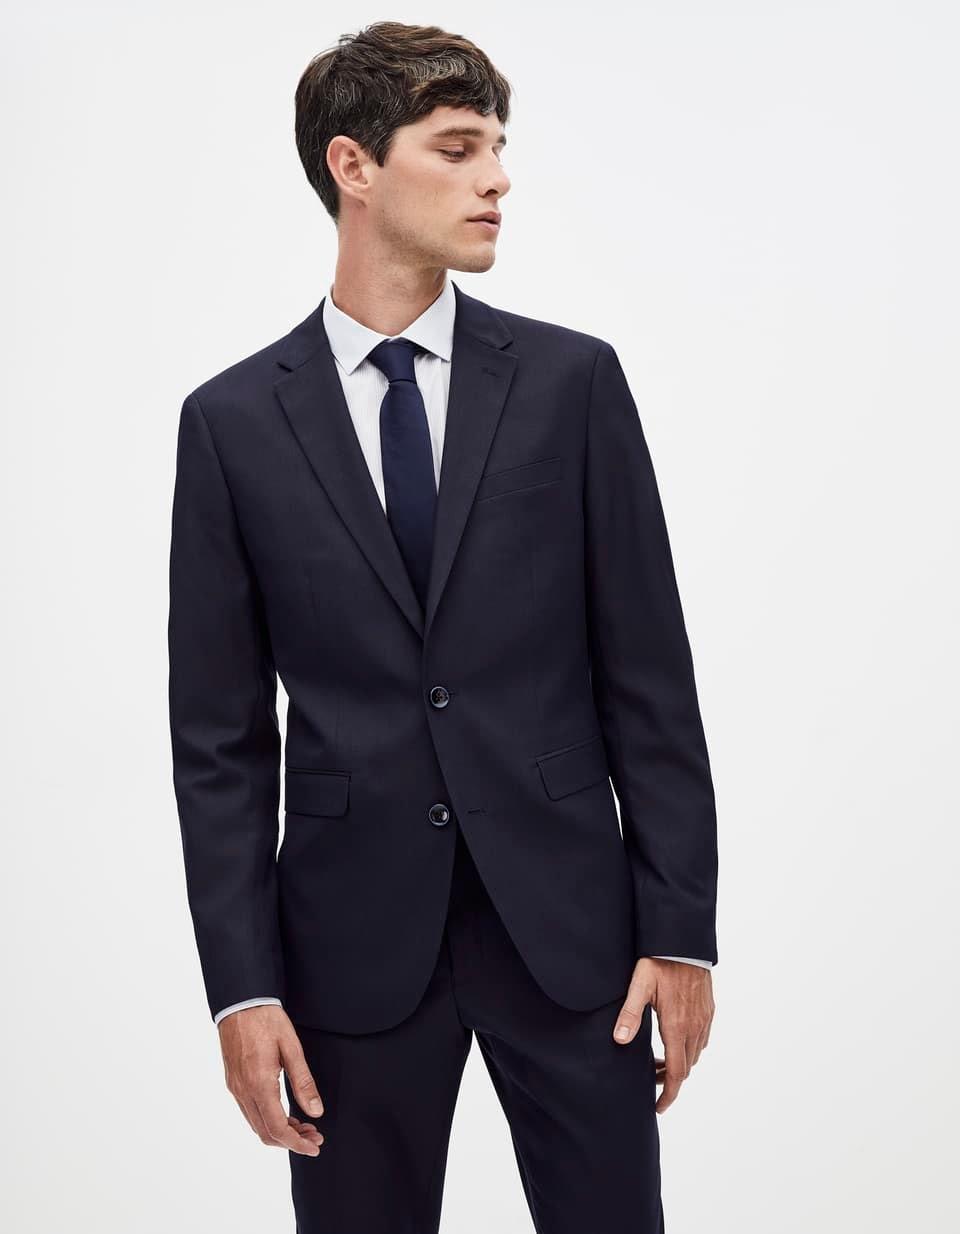 Basiques mode homme - Costume Celio